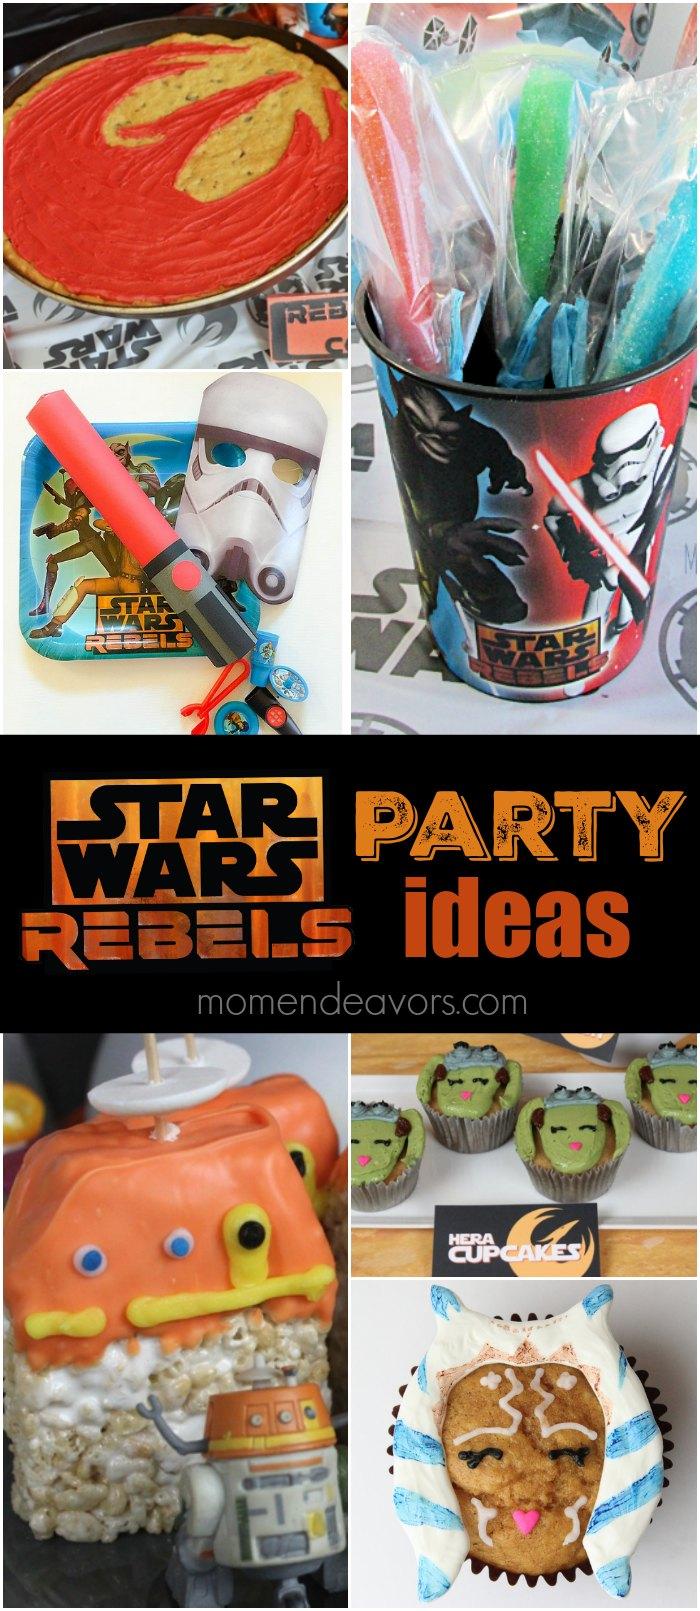 Star Wars Rebels Party Ideas